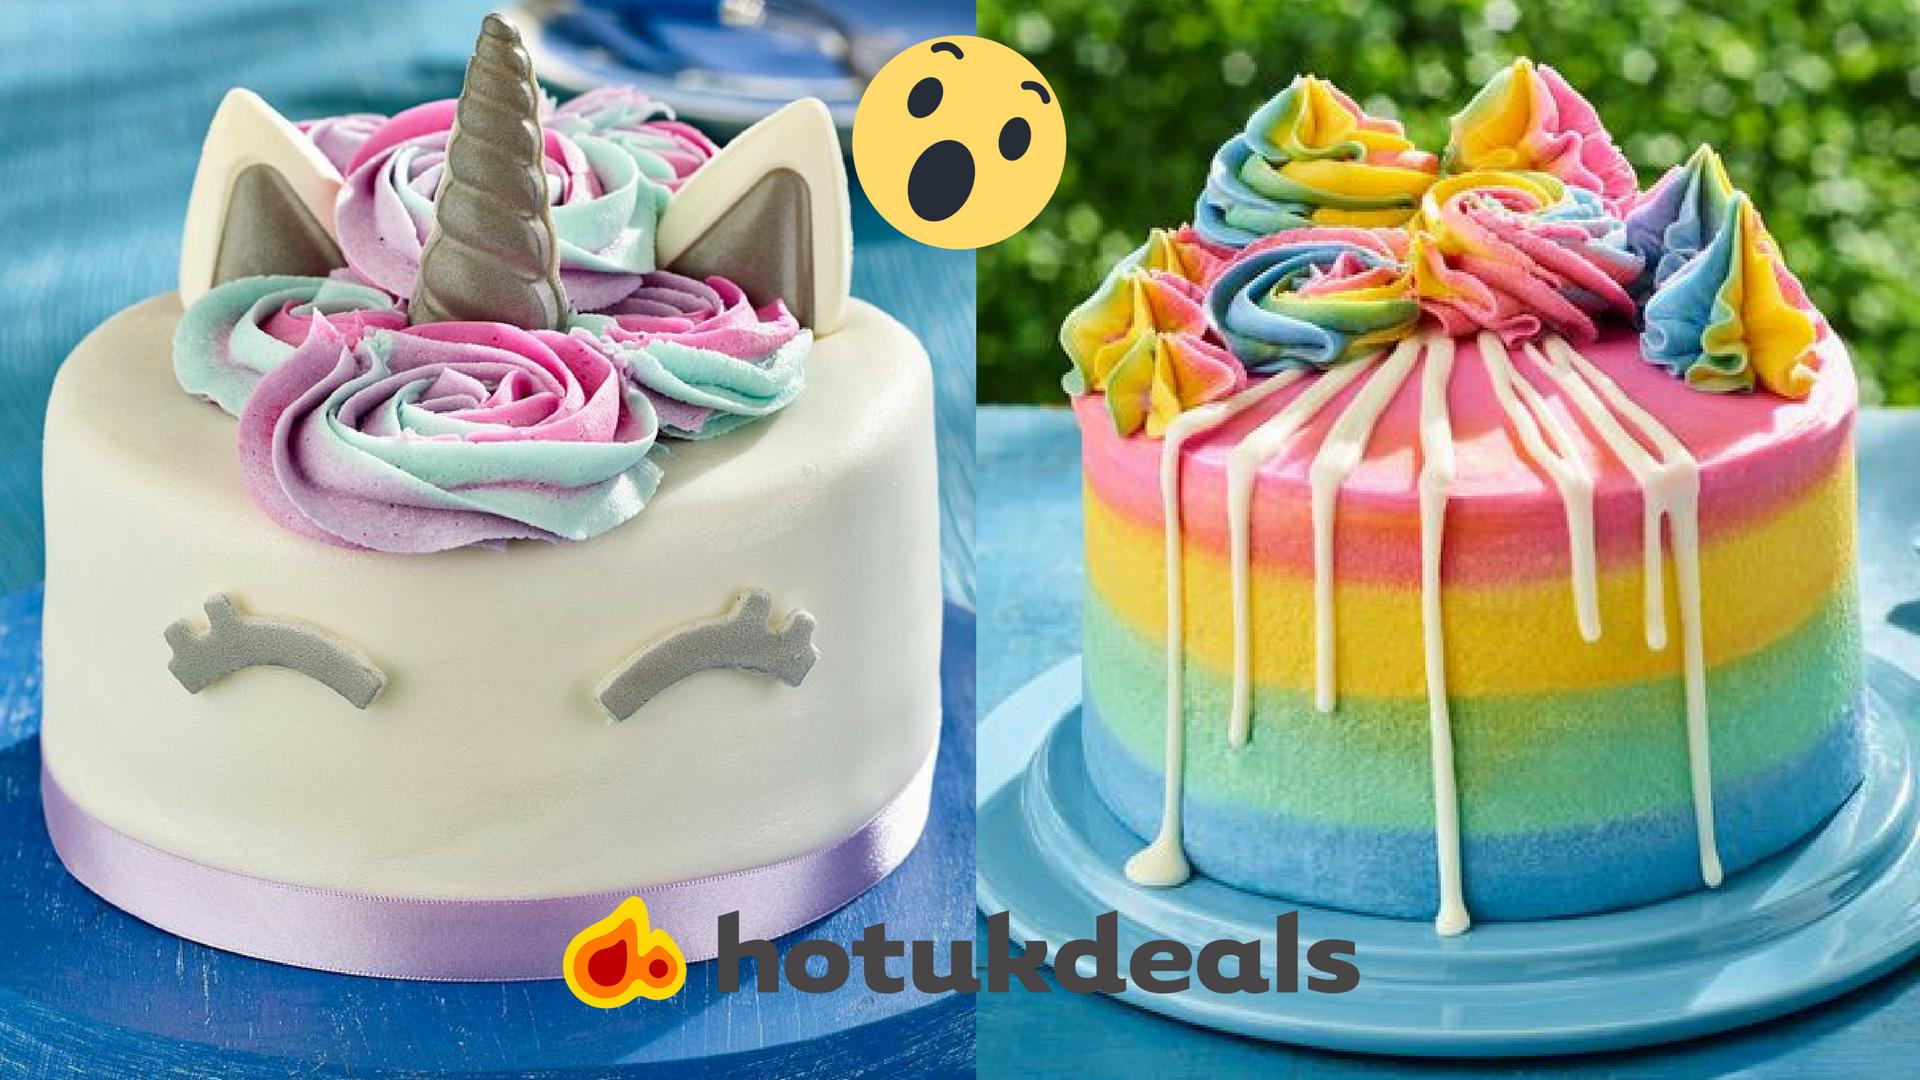 Awe Inspiring Fortnite Birthday Cake Morrisons Wann Kommt In Fortnite Season 9 Funny Birthday Cards Online Hetedamsfinfo